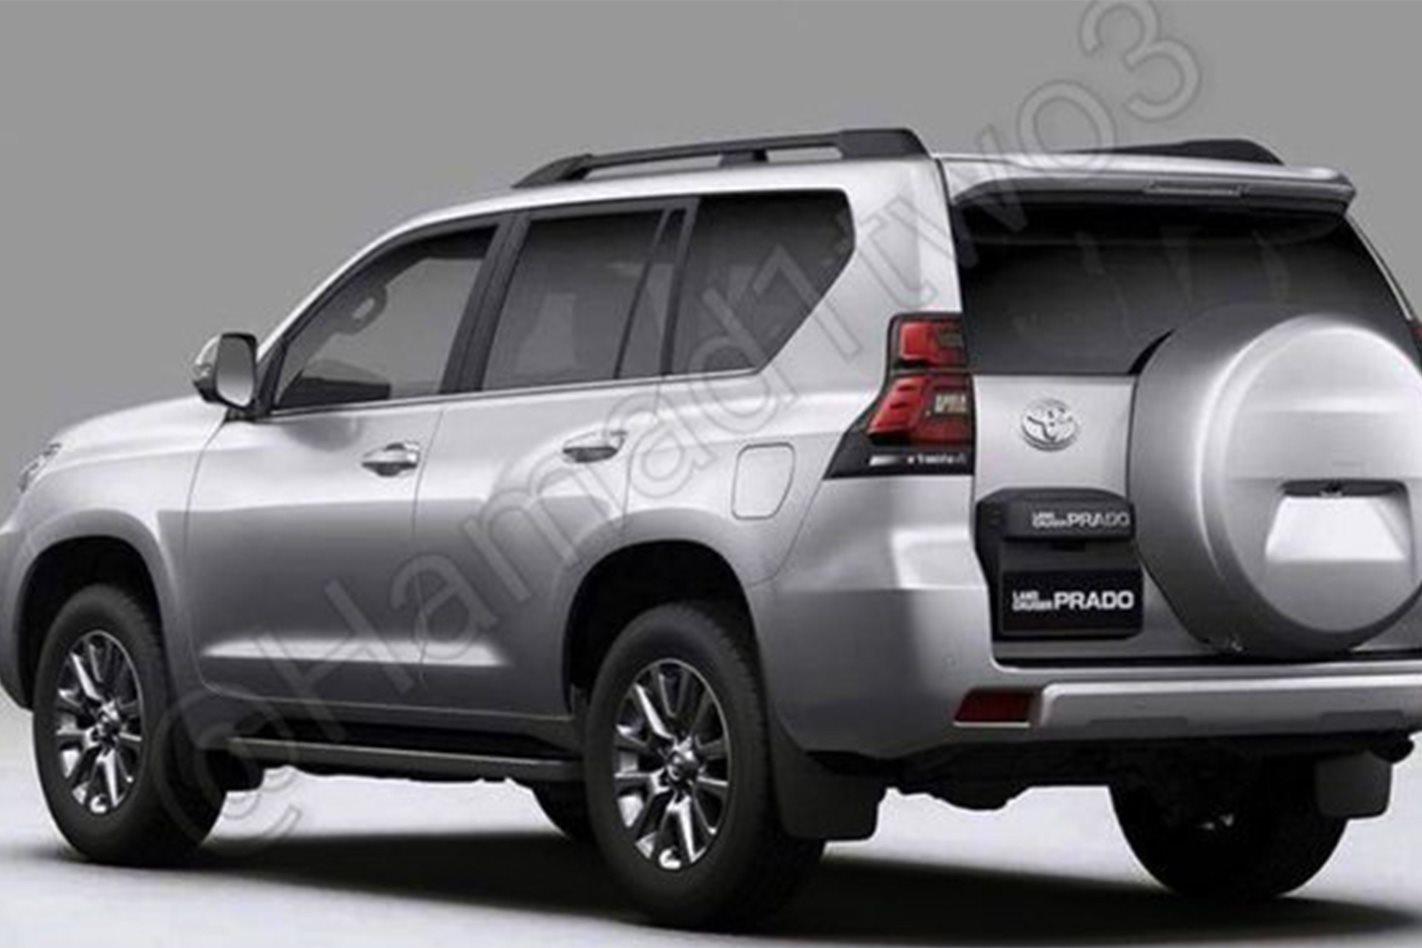 2018 Toyota Prado Leaked Online 4x4 Australia